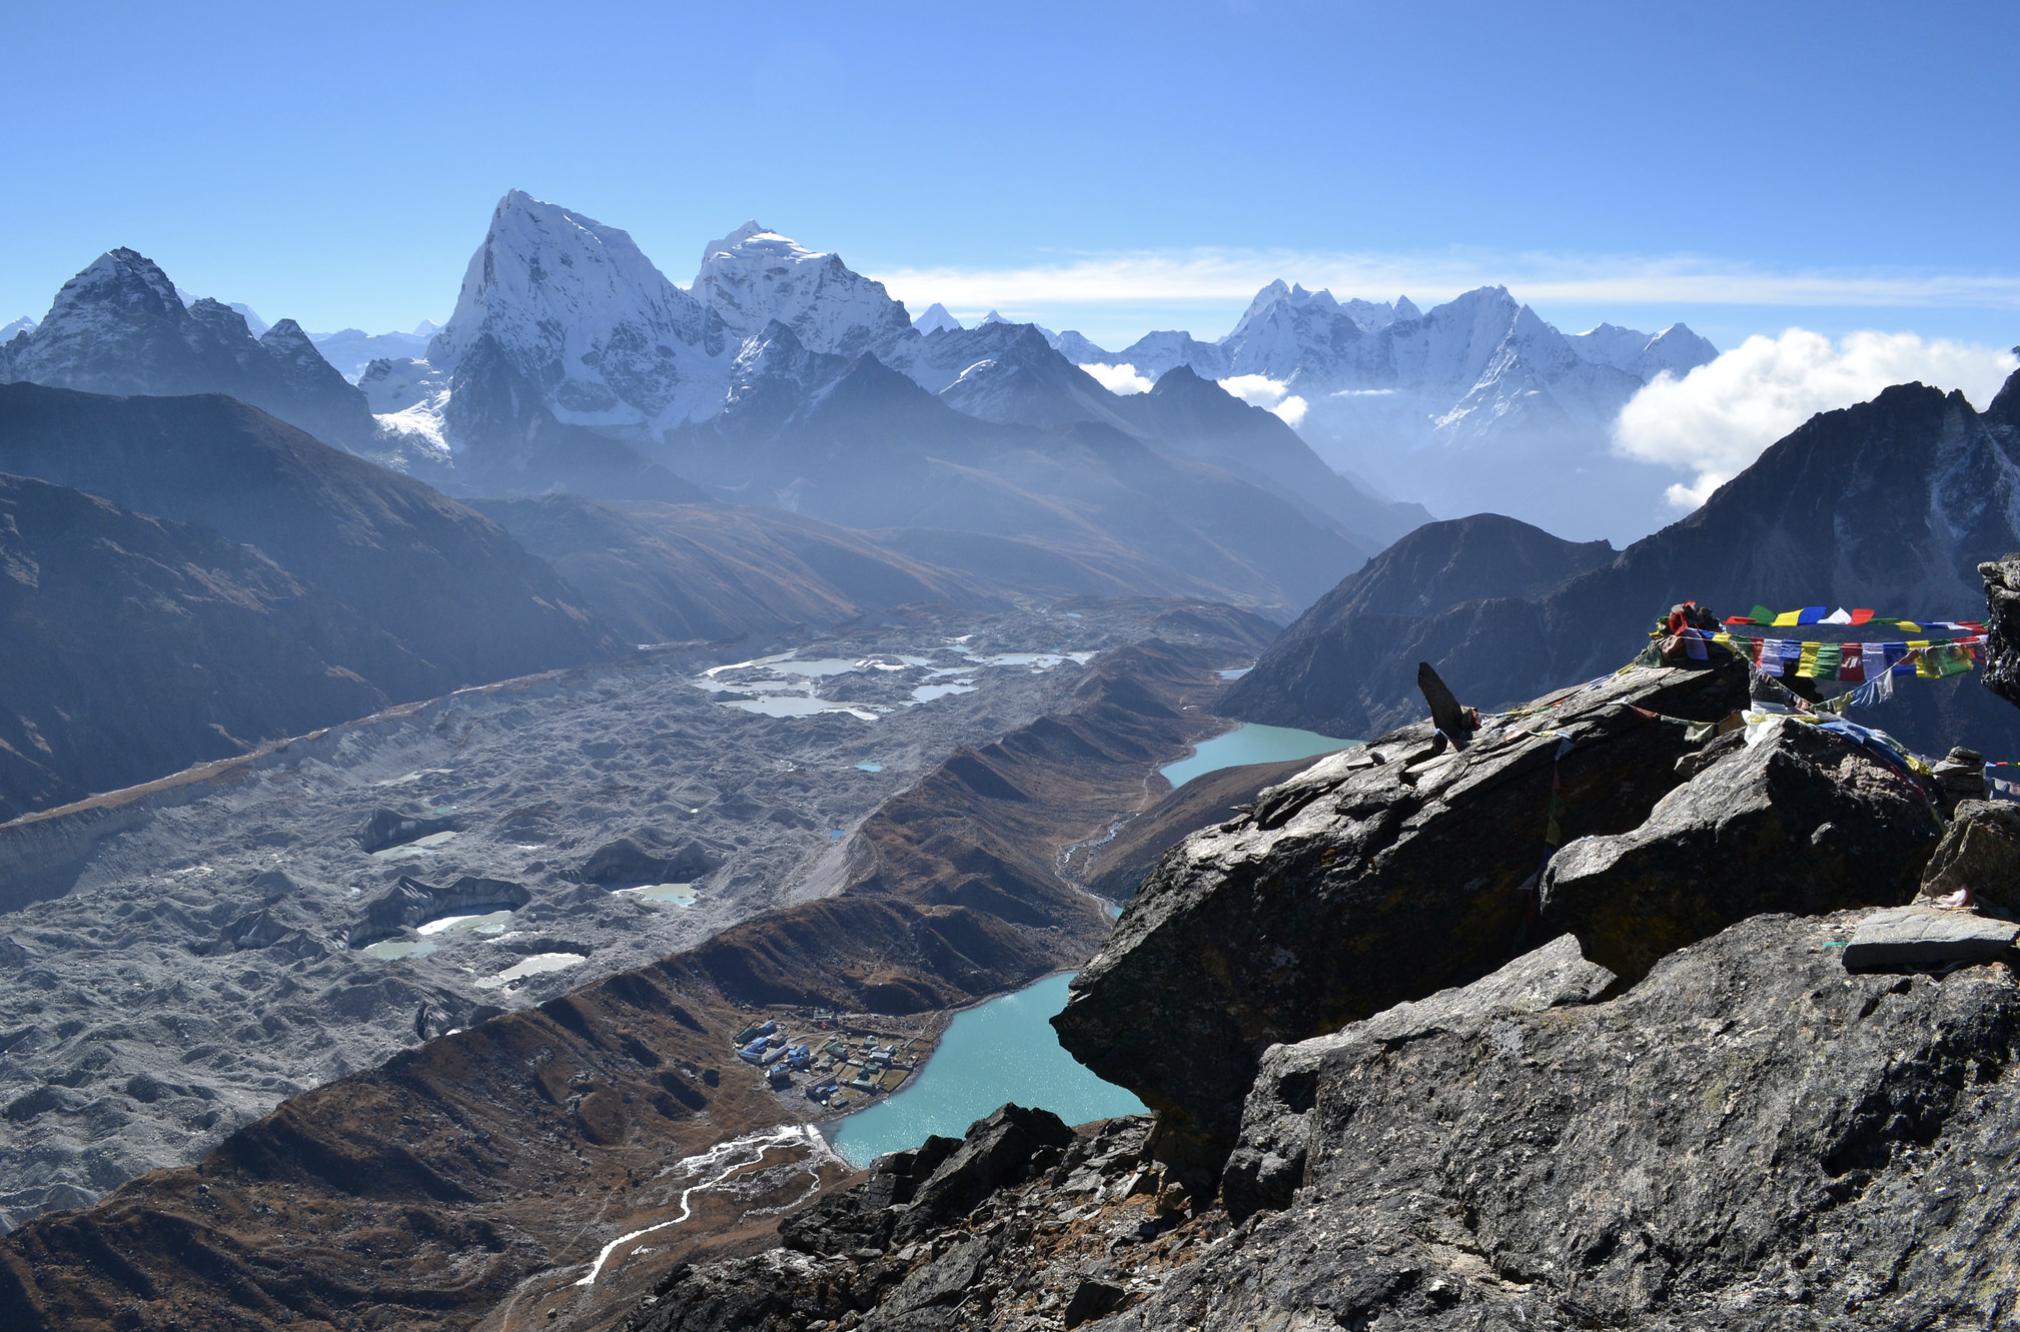 Photo of the Ngozumpa Glacier in Nepal.